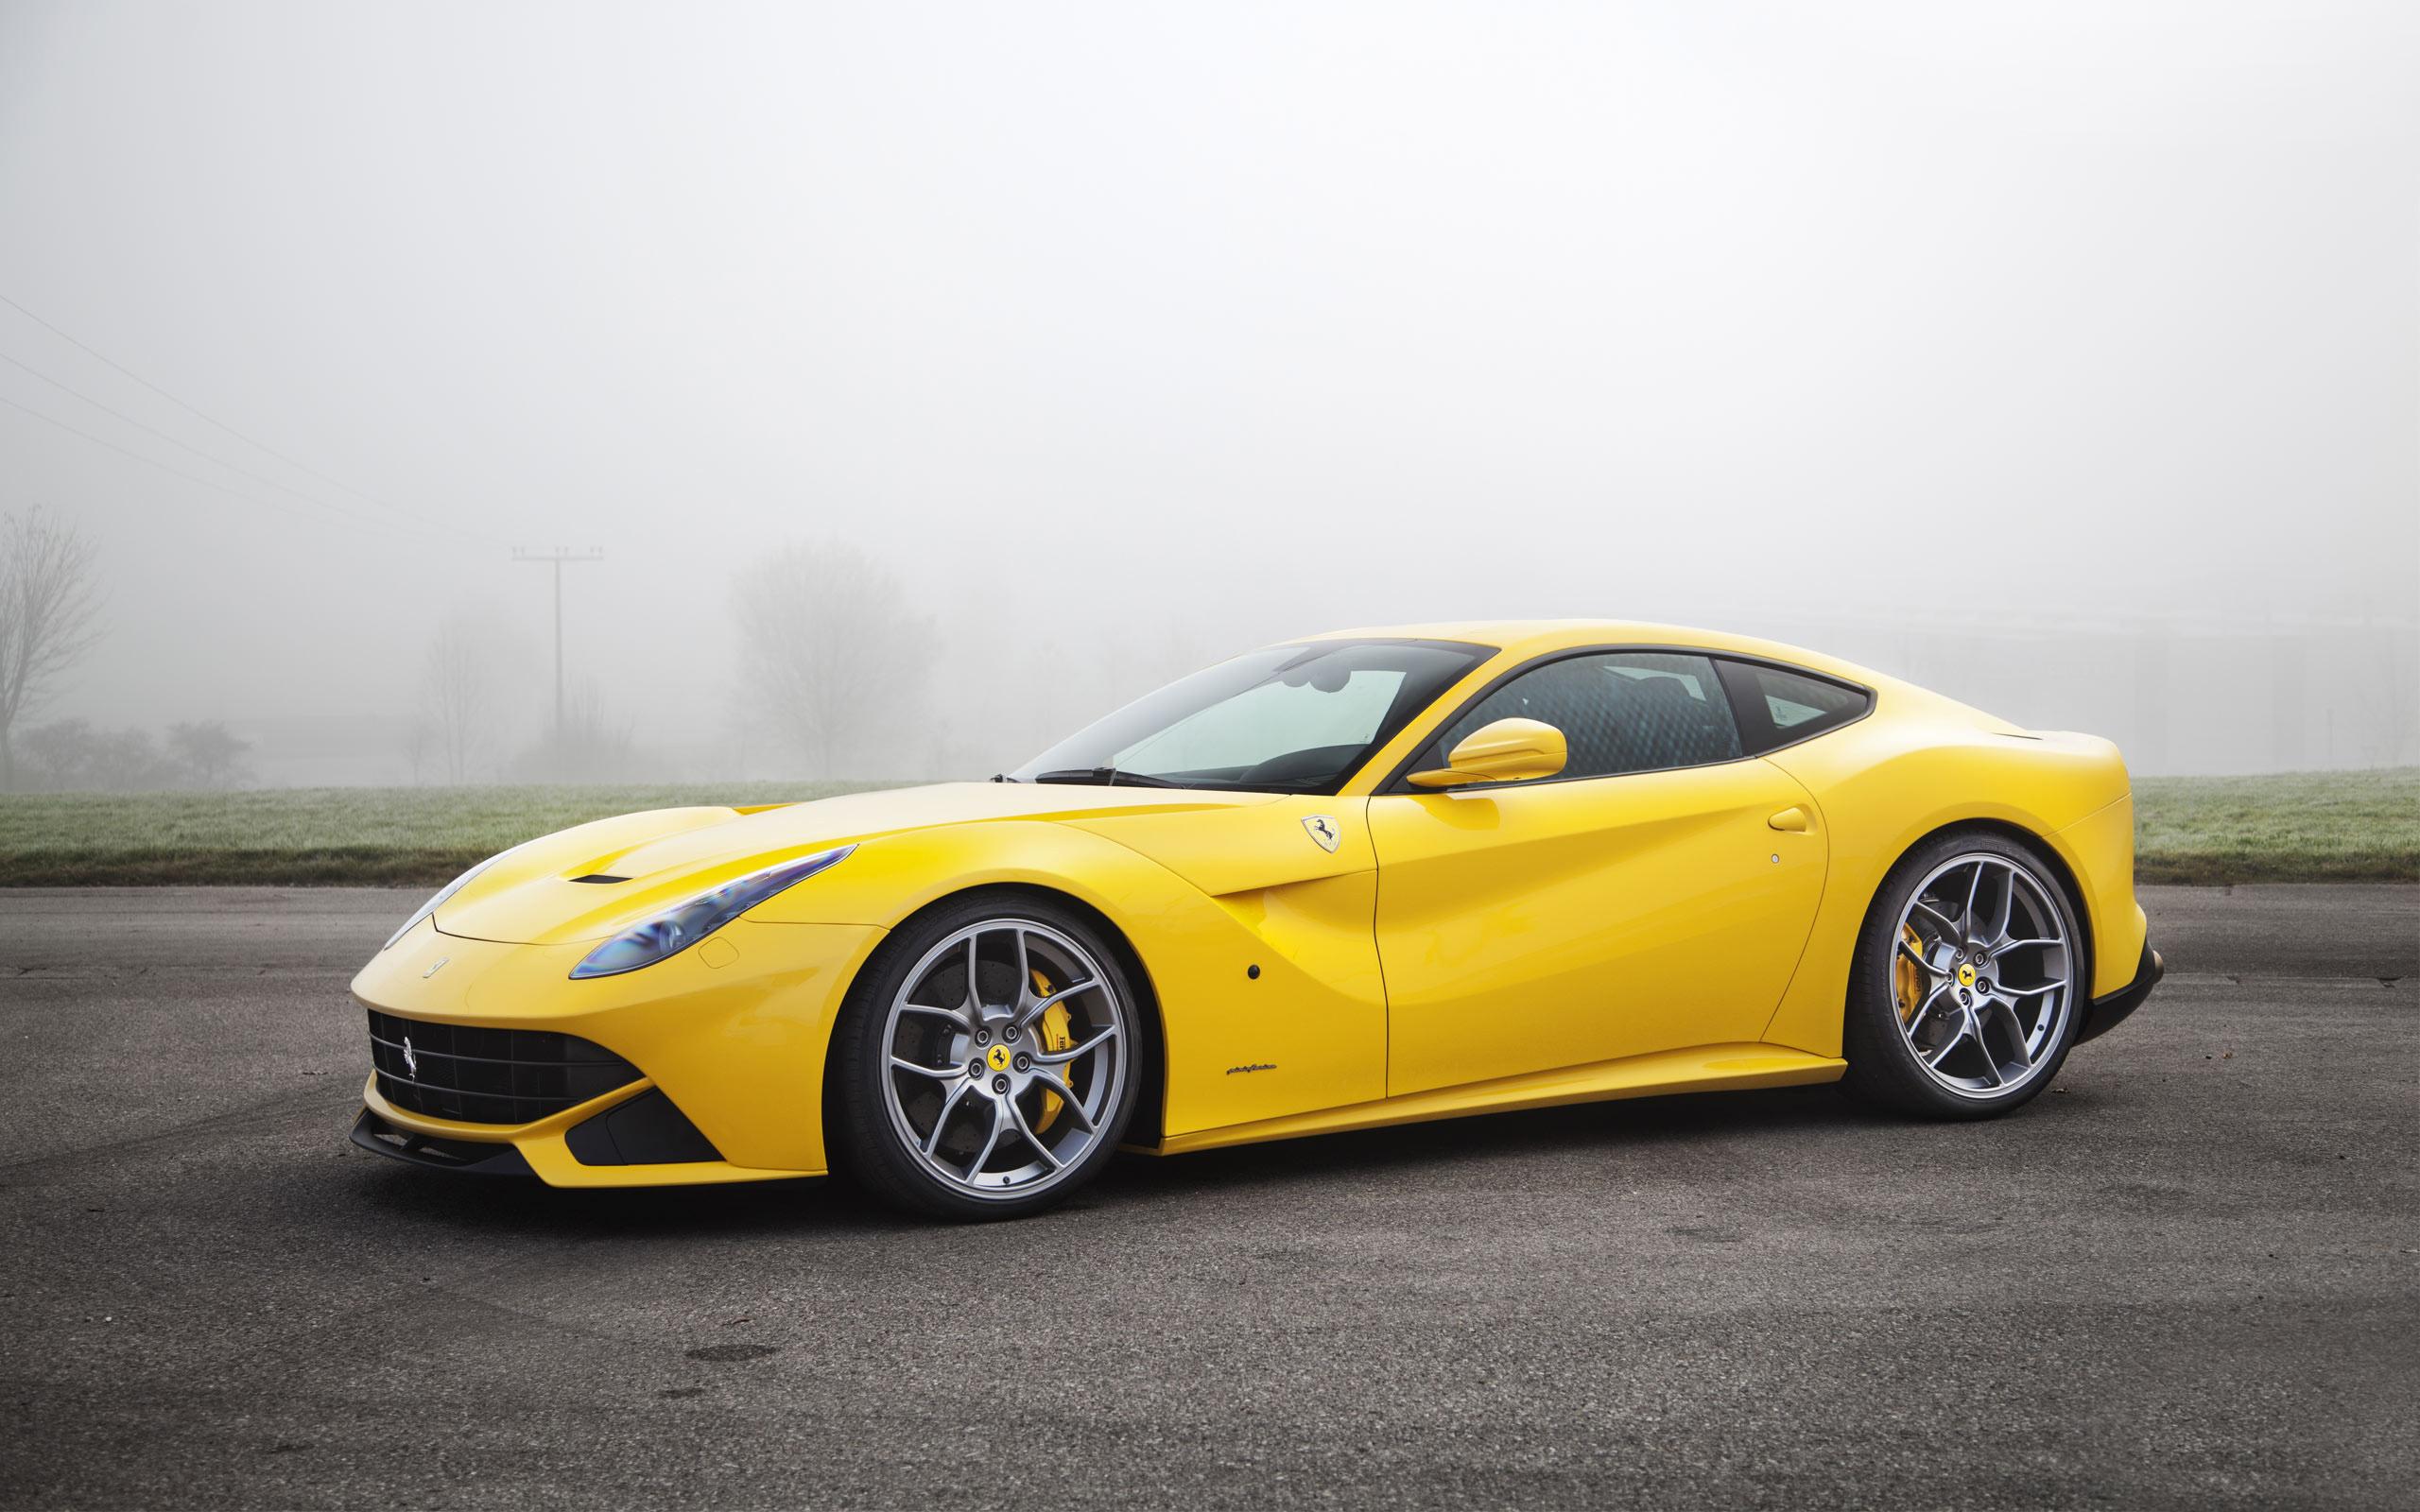 2013 Ferrari F12 Berlinetta Novitec Wallpaper | HD Car ...